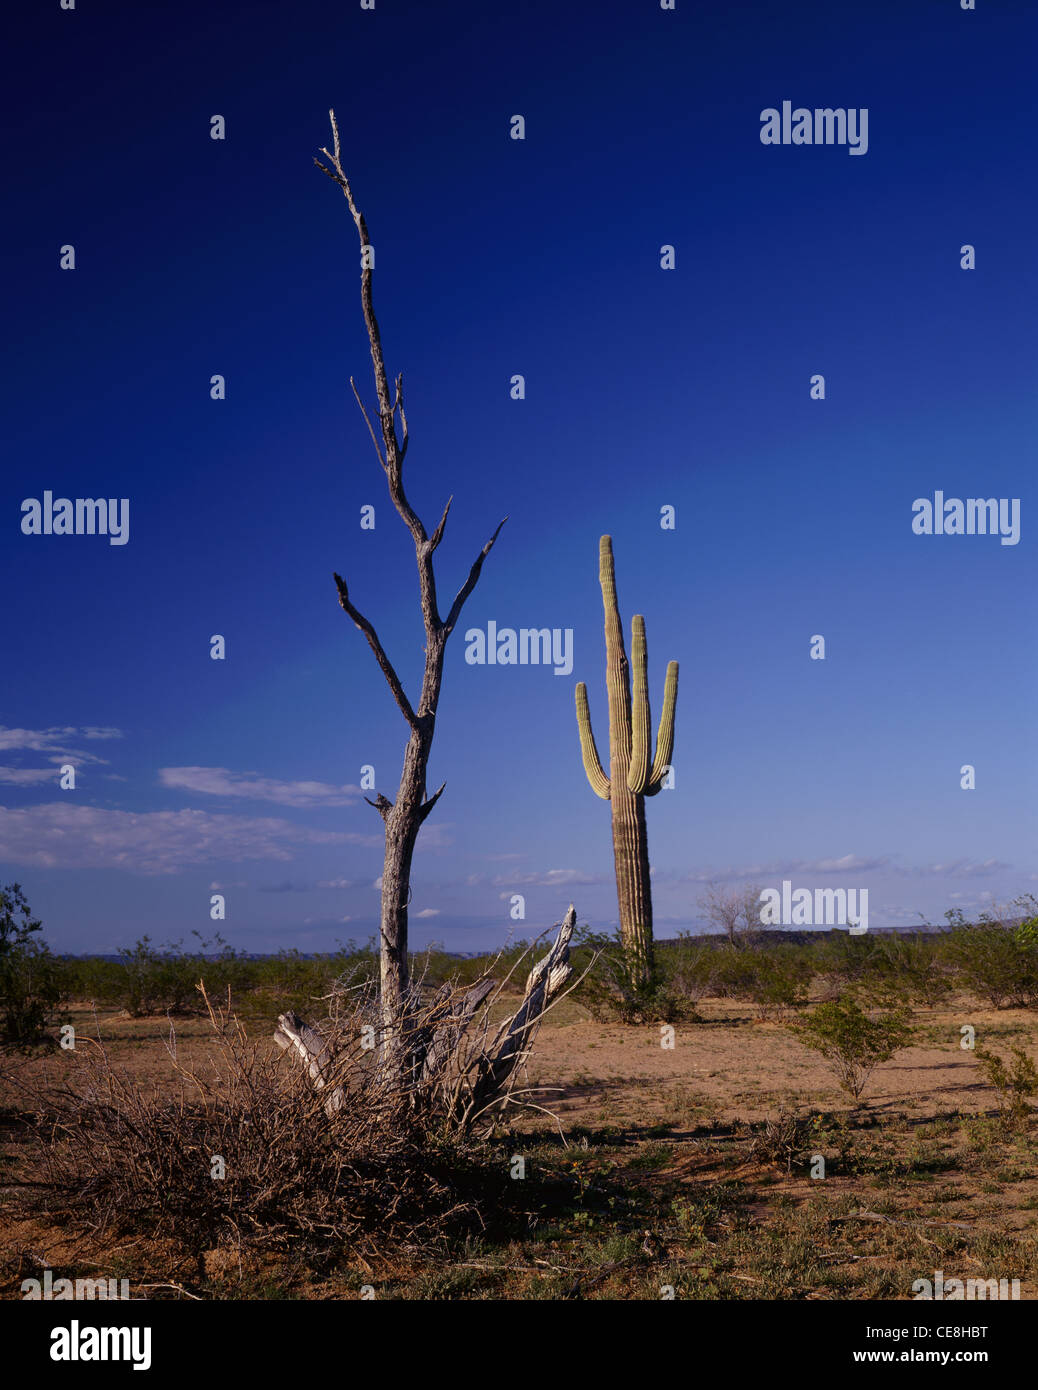 ARIZONA - Saguaro cactus grow in shade then kill their benefactor when no longer needed. Cabeza Prieta Game Range. - Stock Image